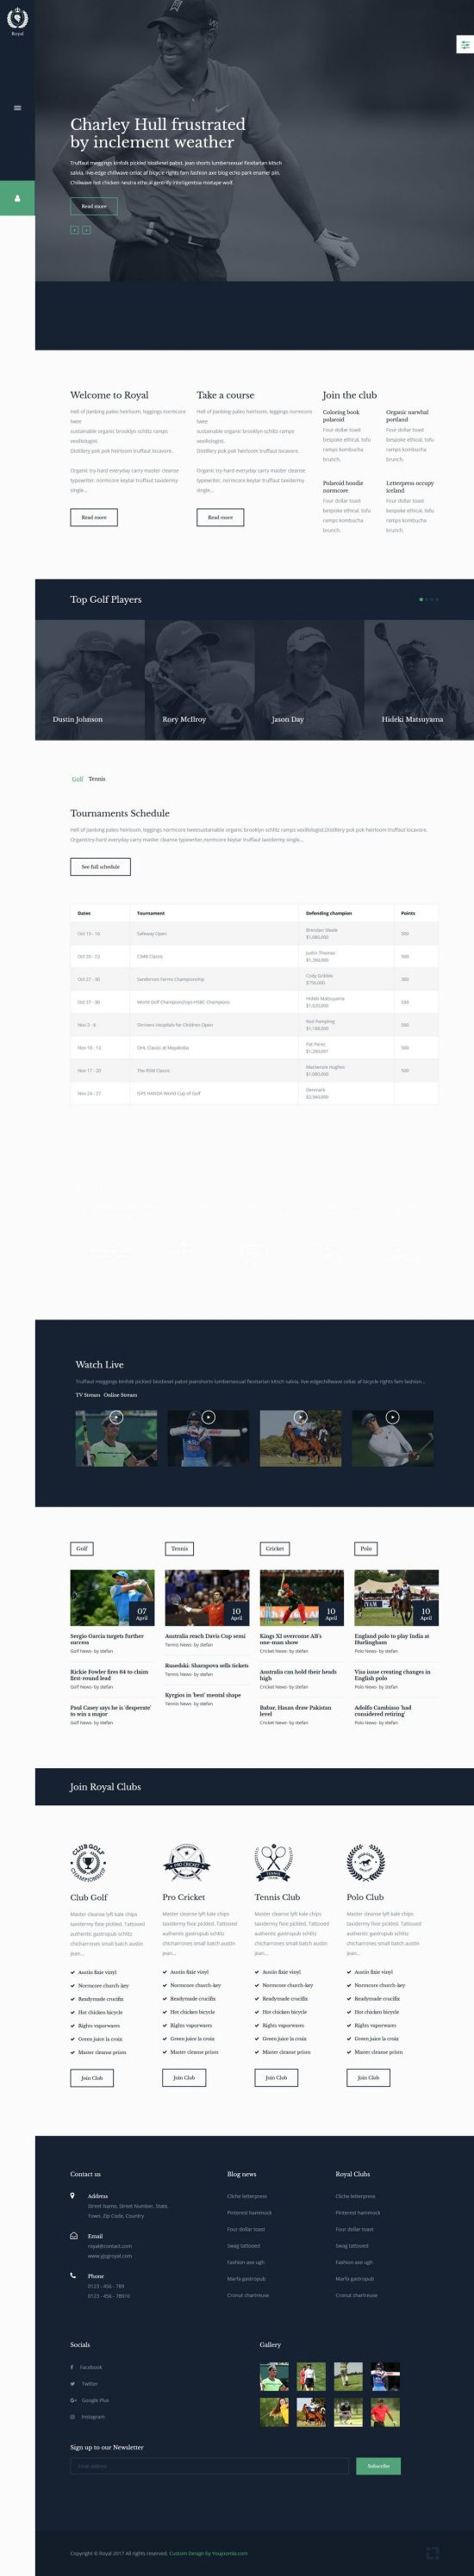 royal sports you joomla template 01 - Royal Sports Joomla Template